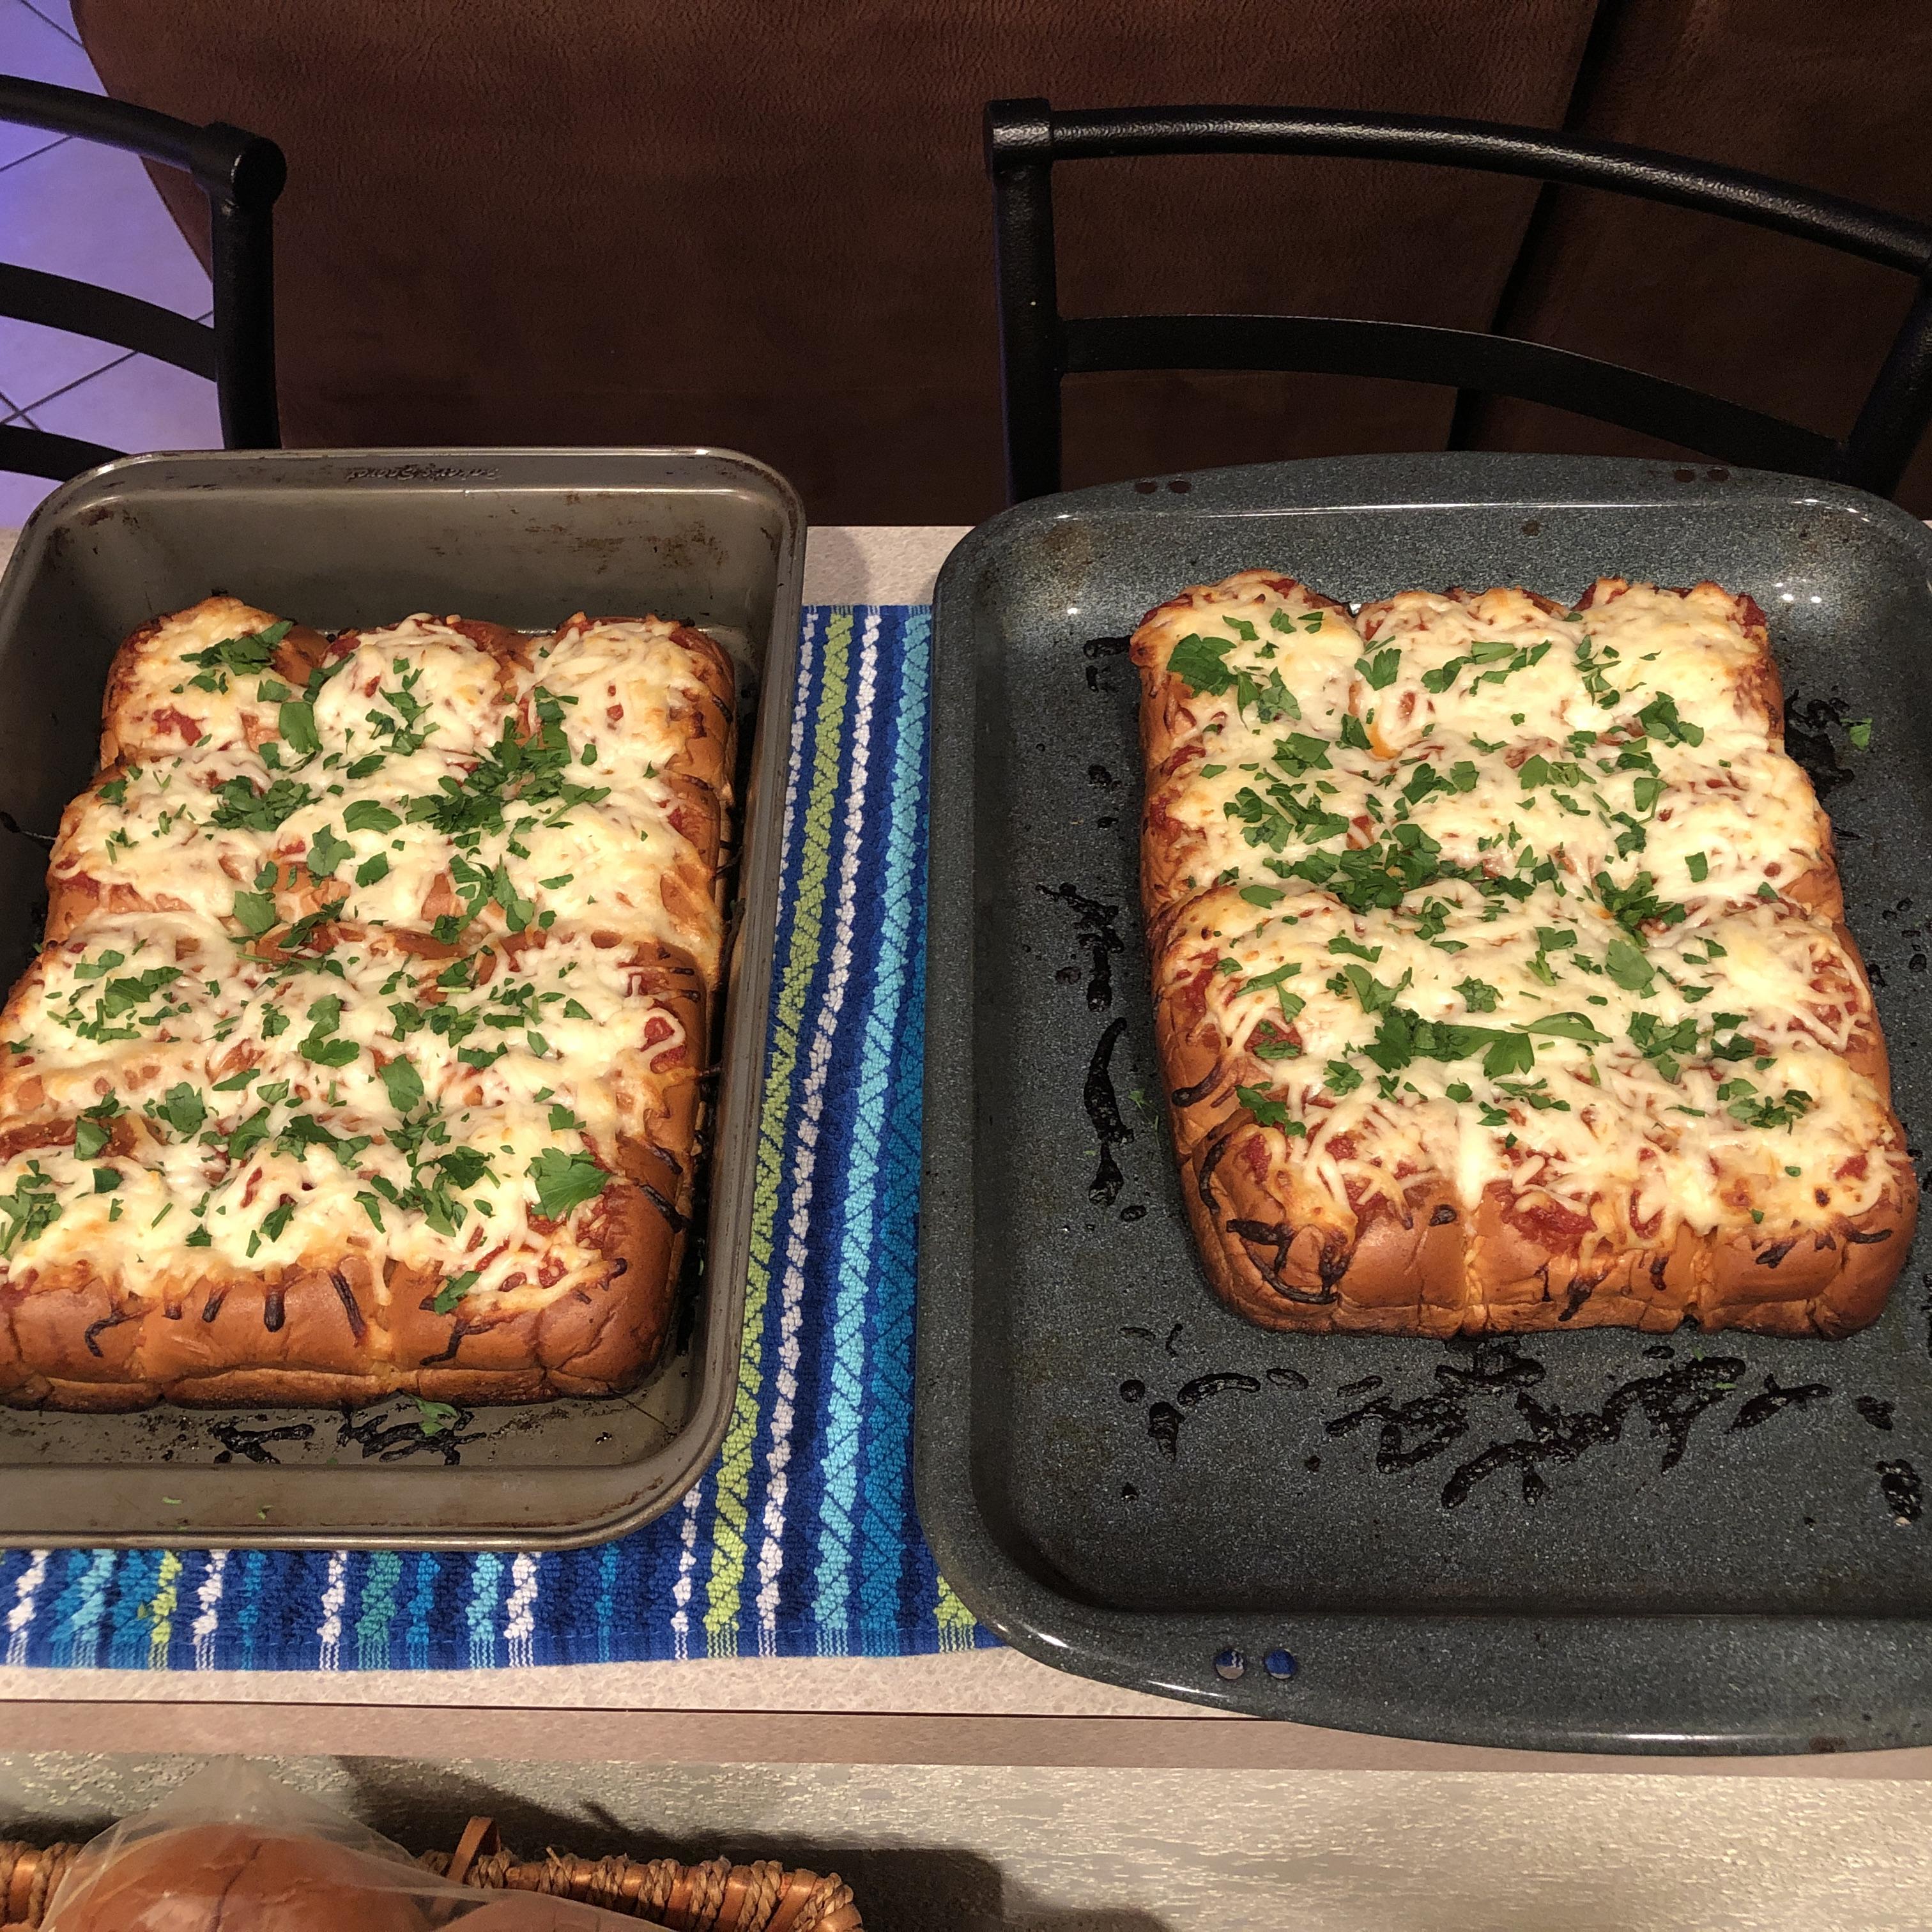 Meatball-Stuffed Garlic Bread Sliders